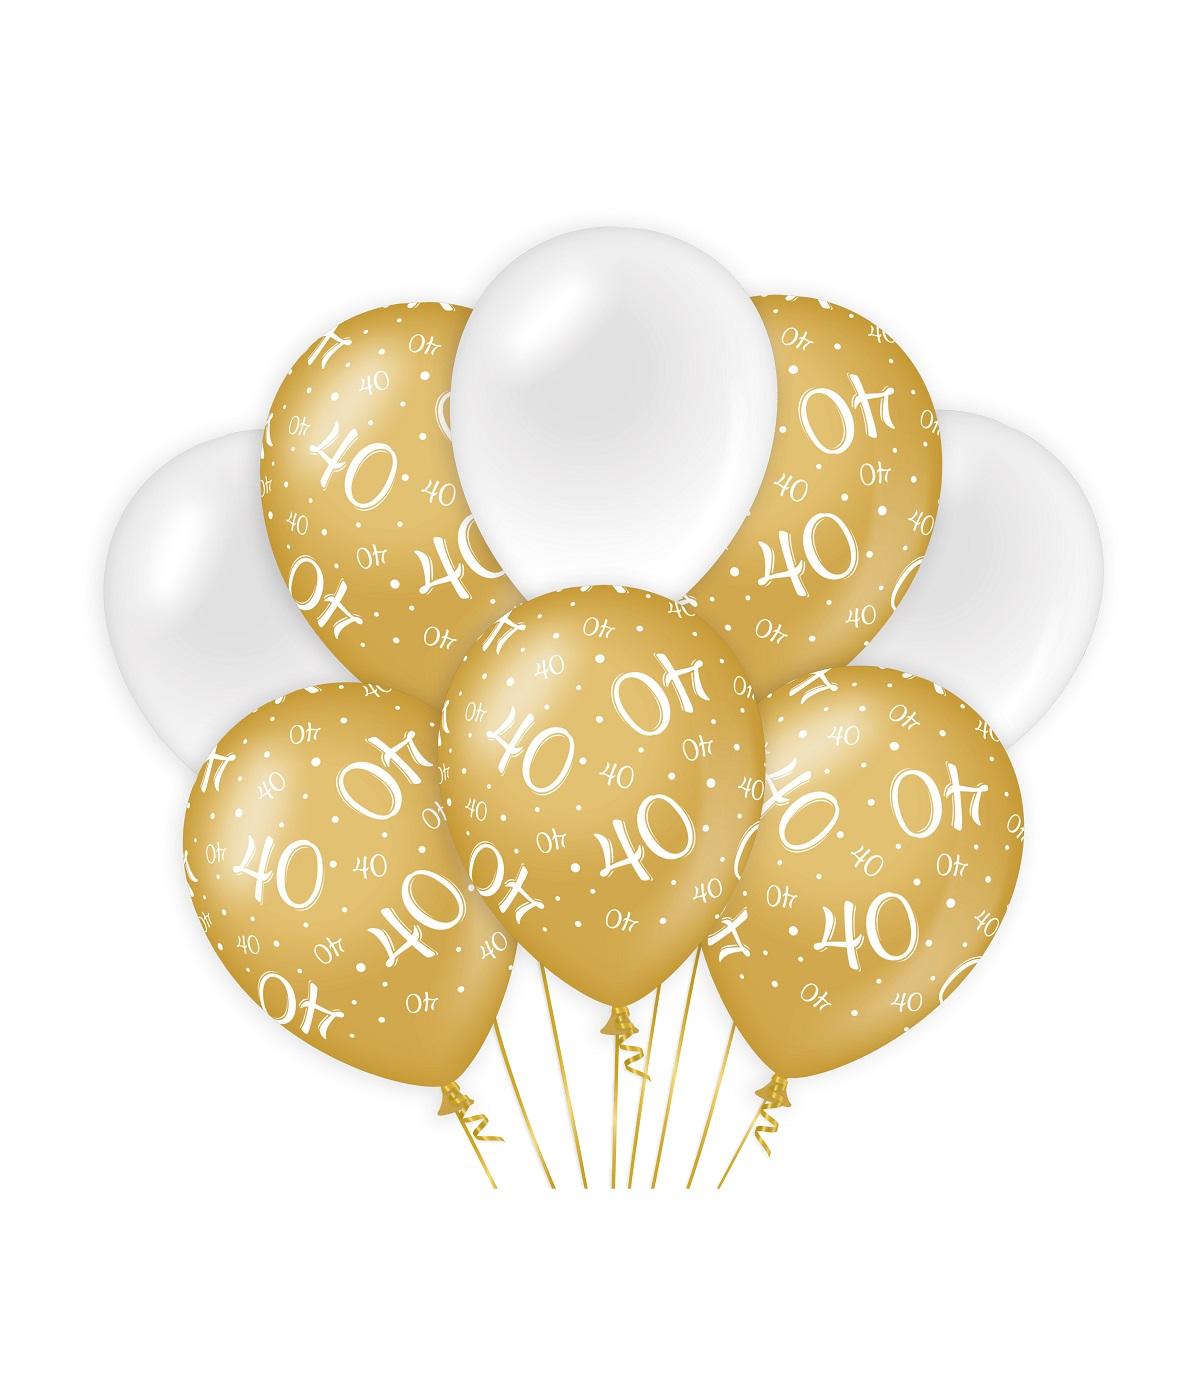 "8st Ballonnen 40 Jaar Goud/Wit 12"""